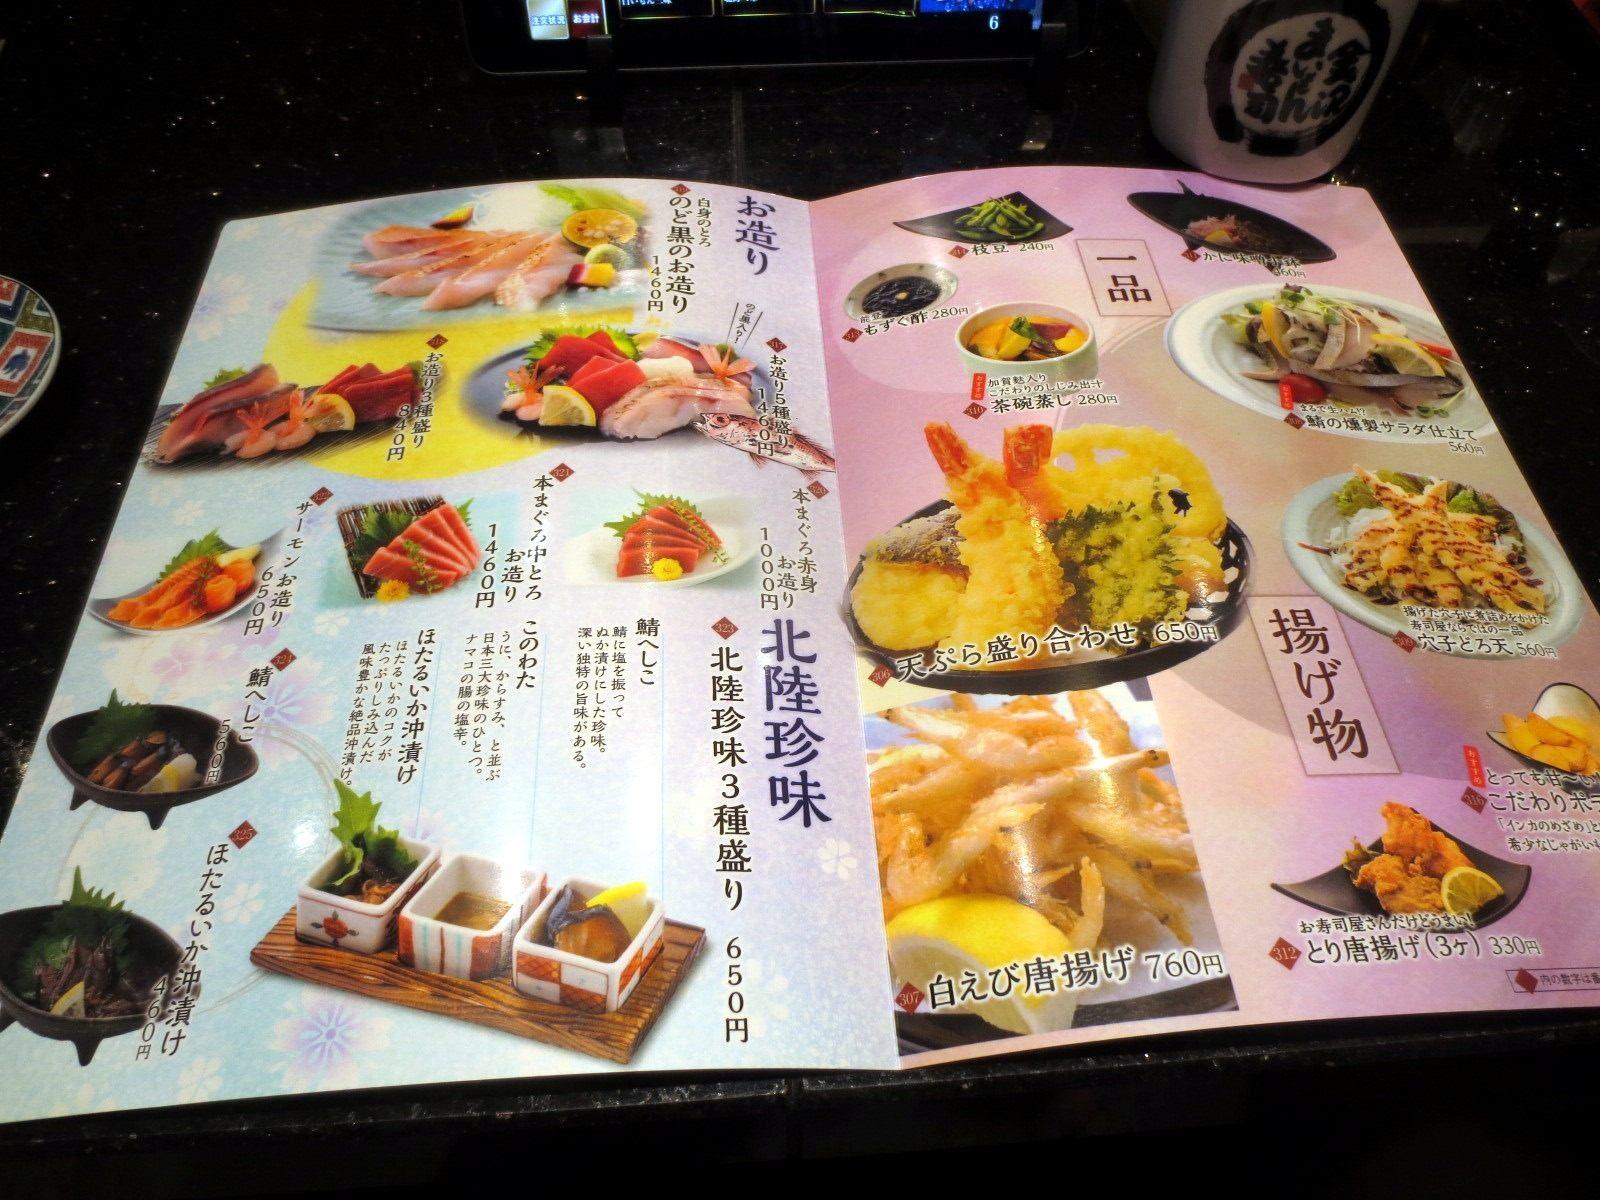 They have tempura and sashimi, too.